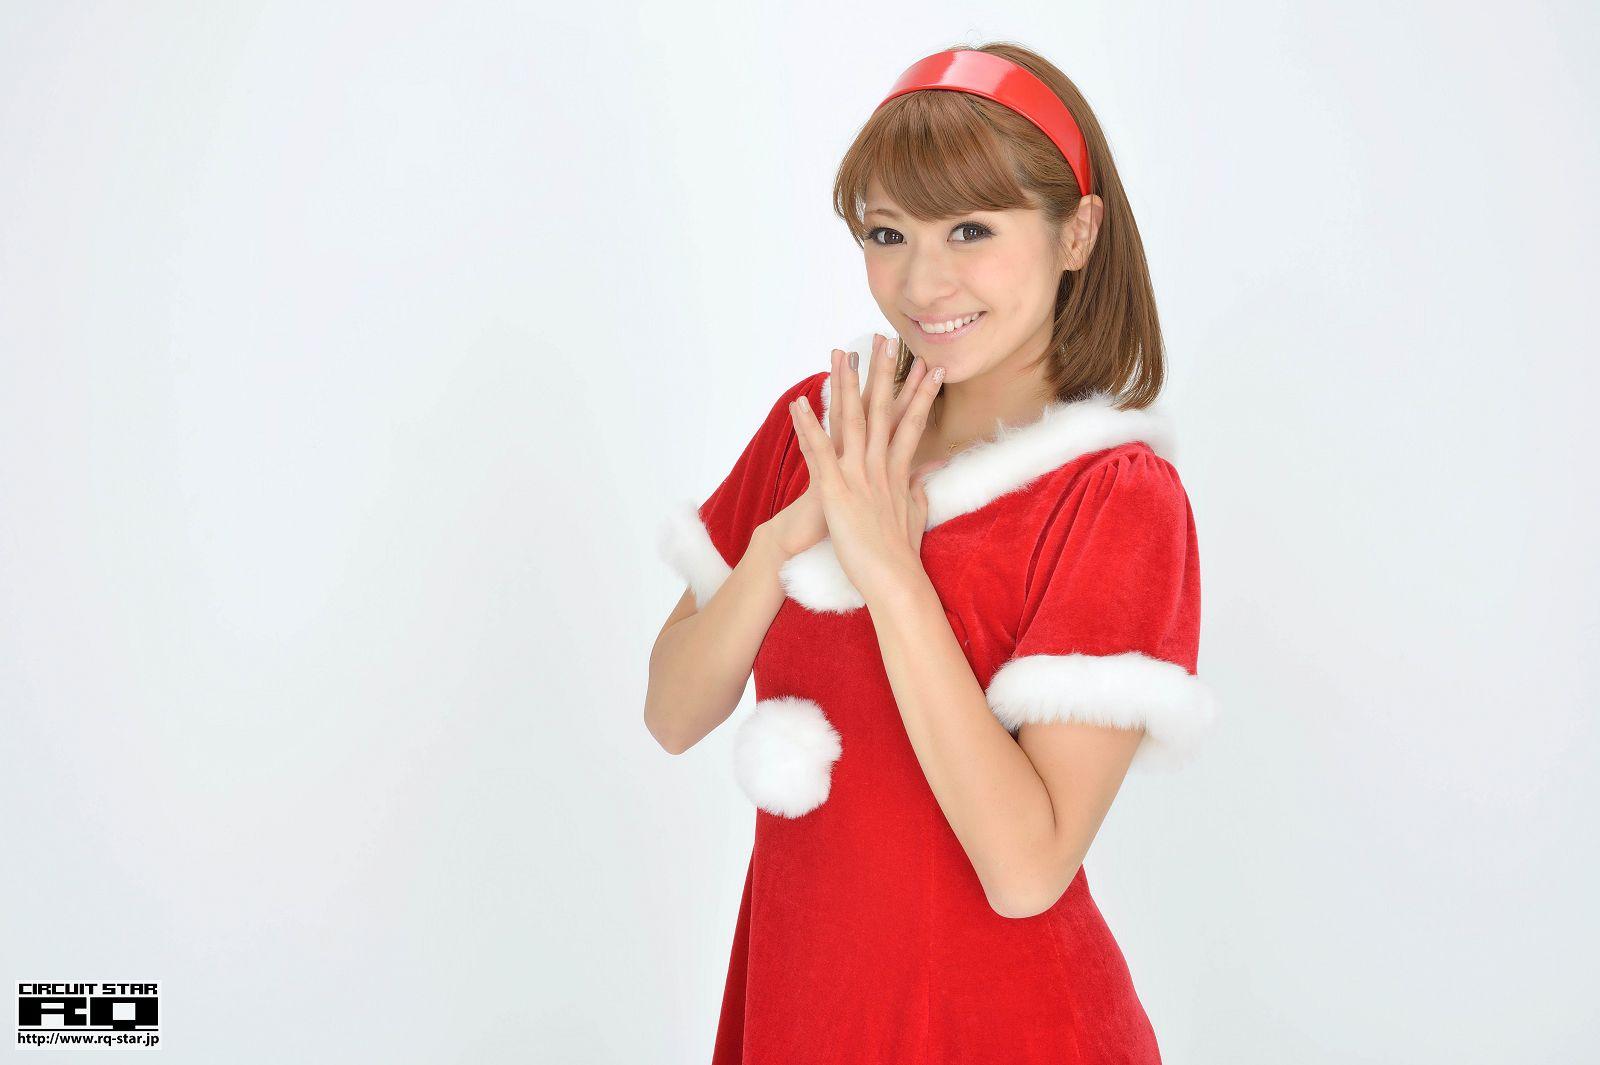 [RQ STAR美女] NO.00732 Mai Shibahara 柴原麻衣 Merry Christmas[30P] RQ STAR 第1张